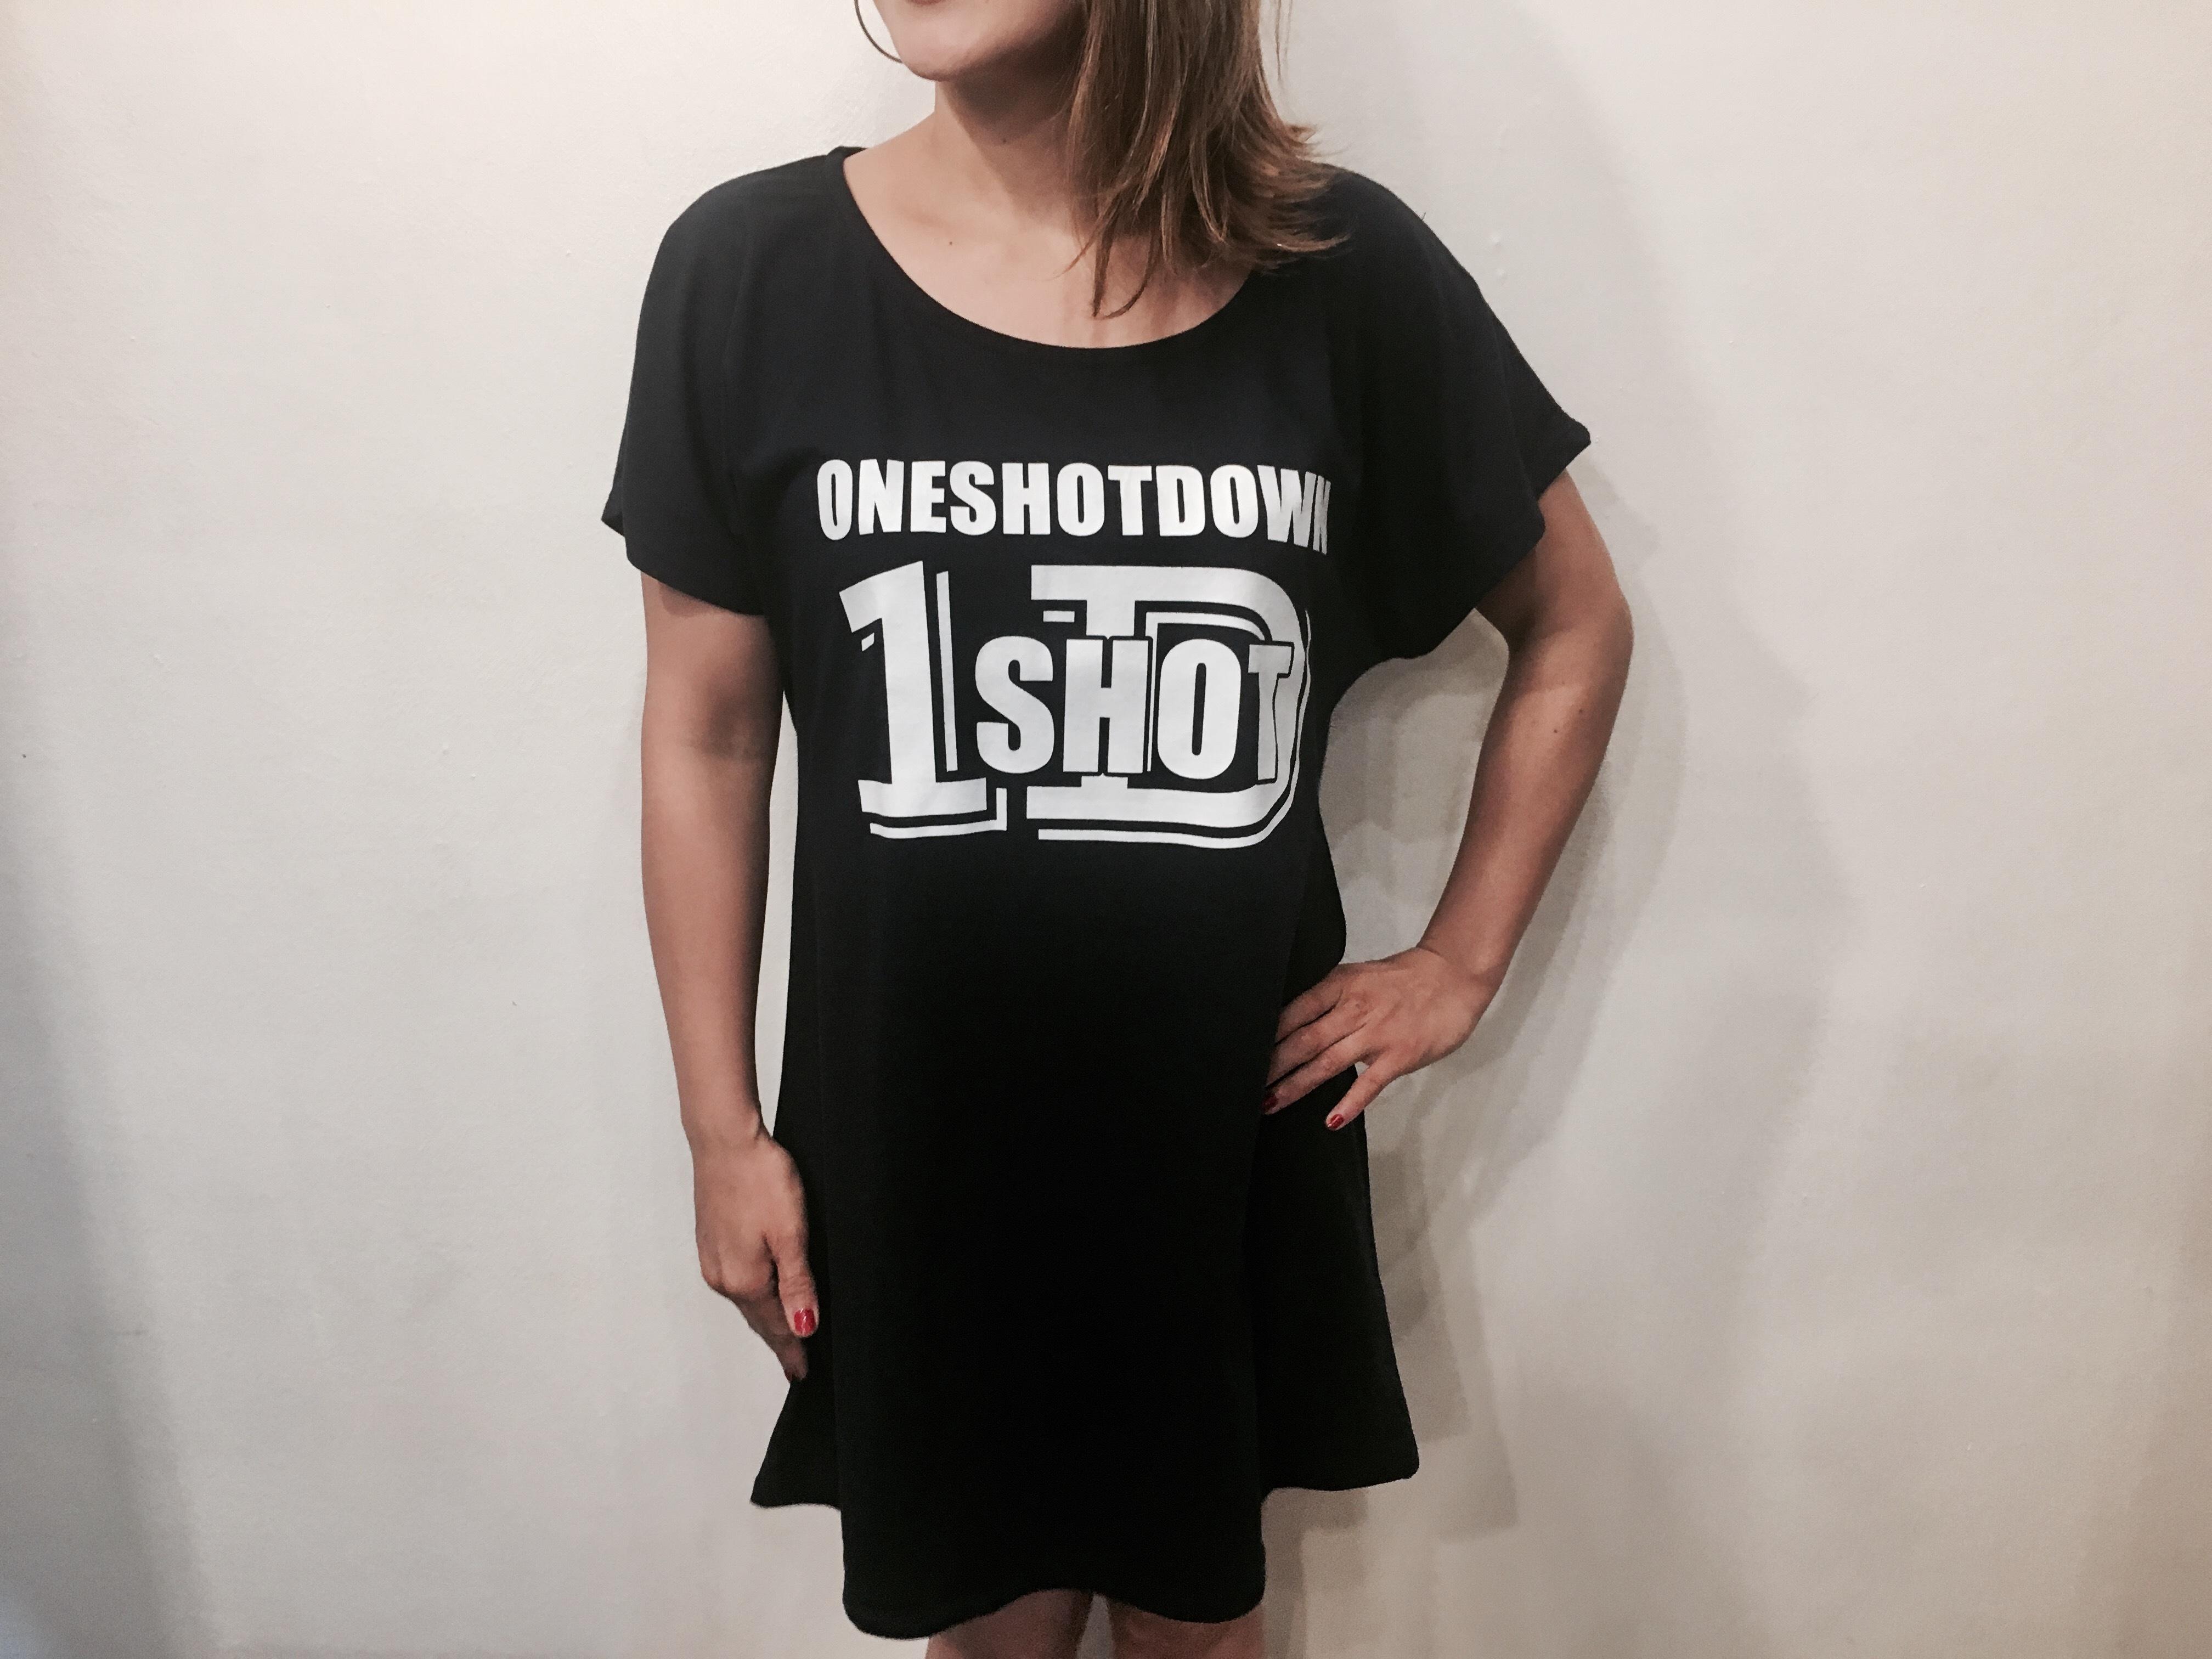 ONESHOTDOWN ガールズ ワンピースTシャツ - 画像5